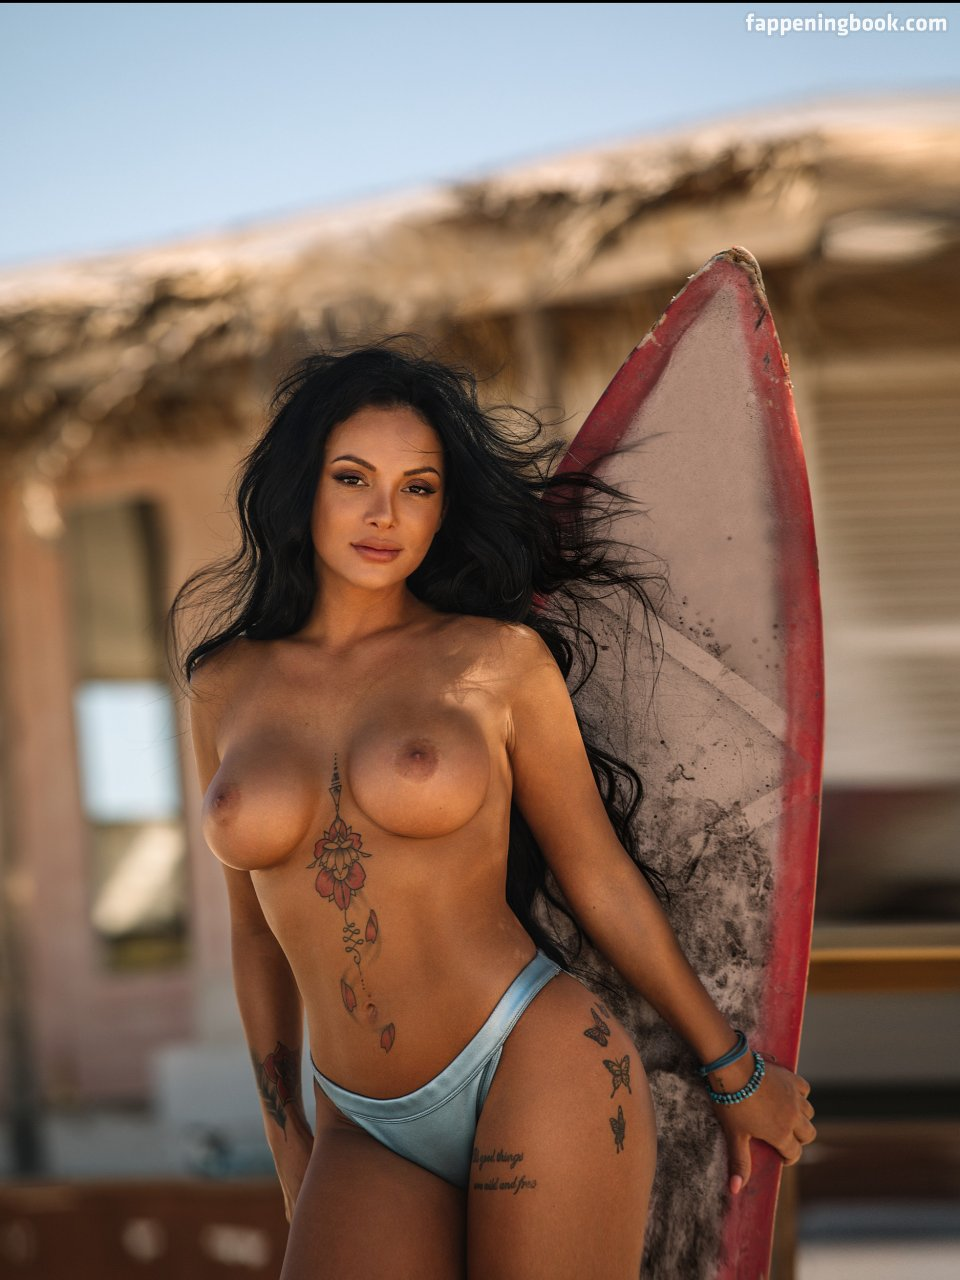 Emilija mihailova nude